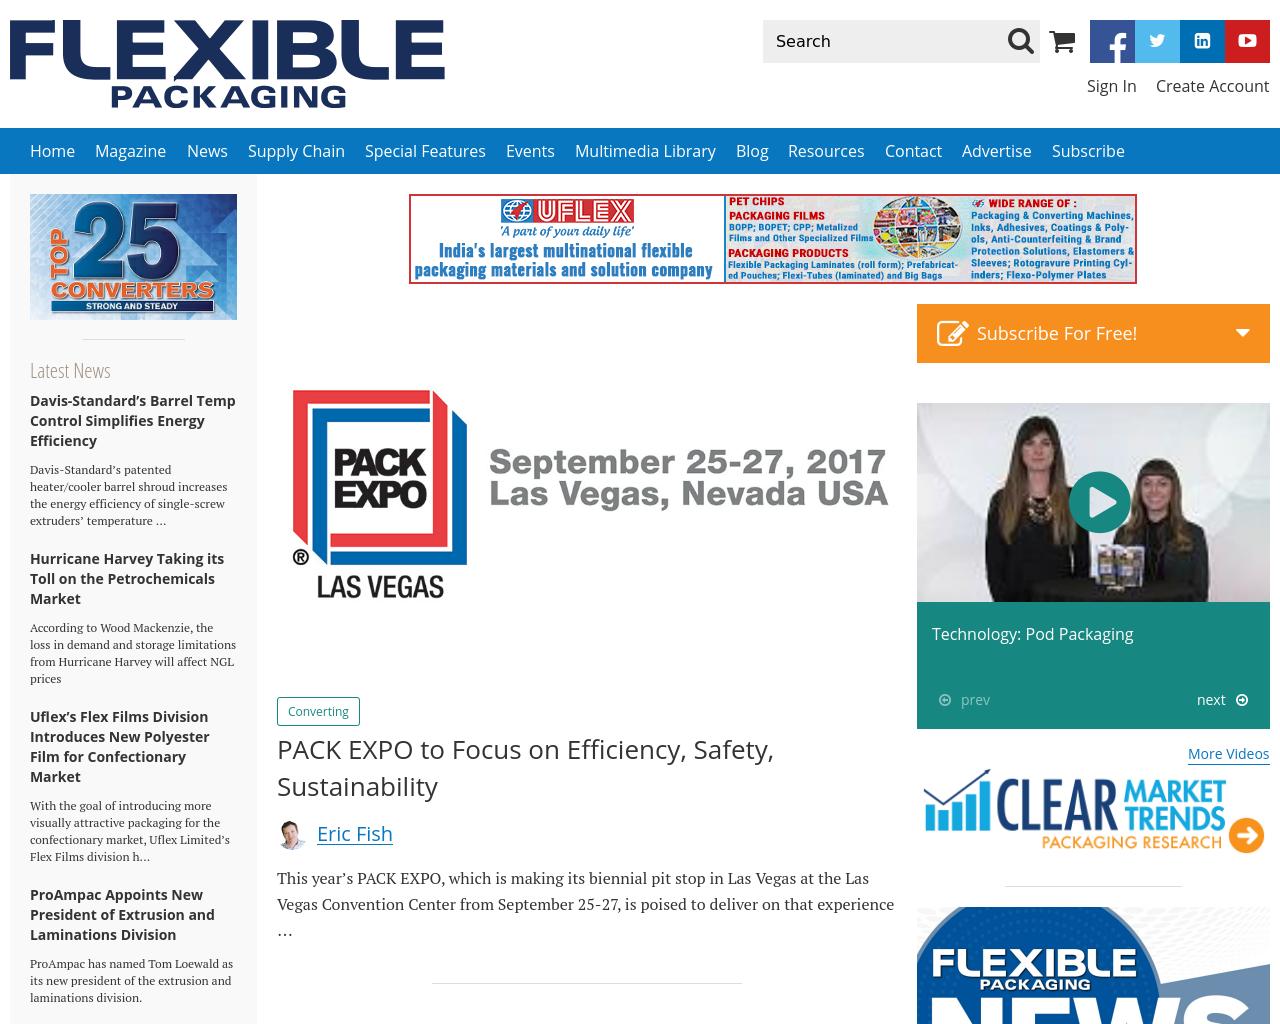 Flexible-Packaging-Advertising-Reviews-Pricing